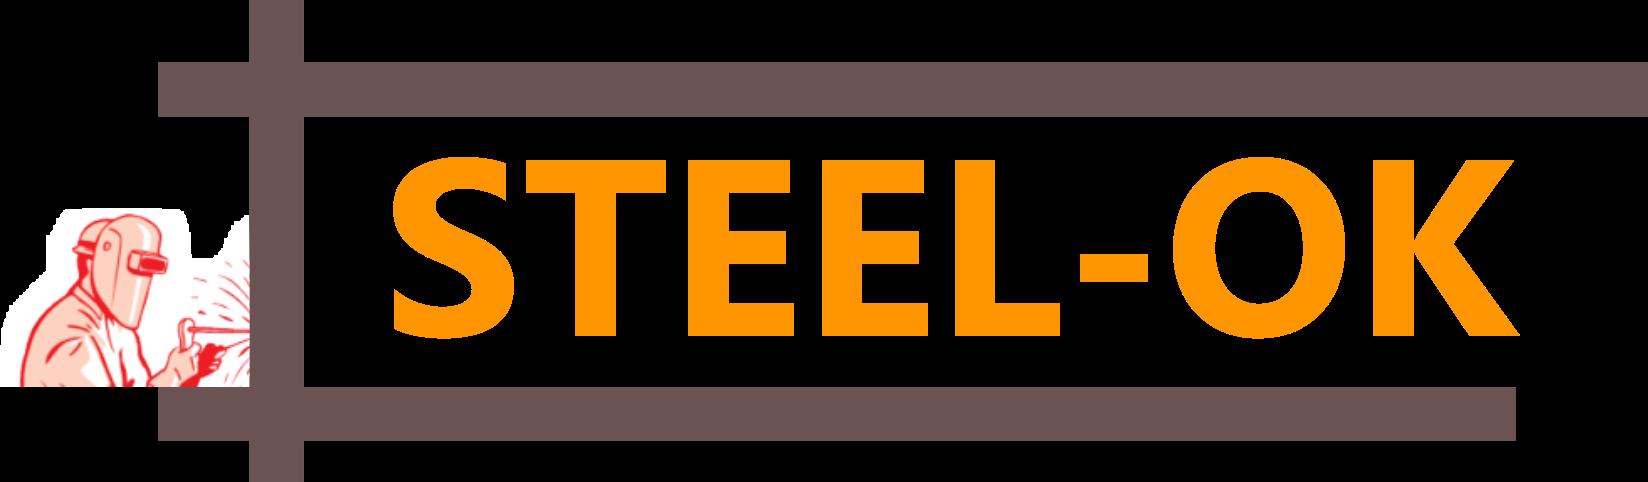 STEEL-OK